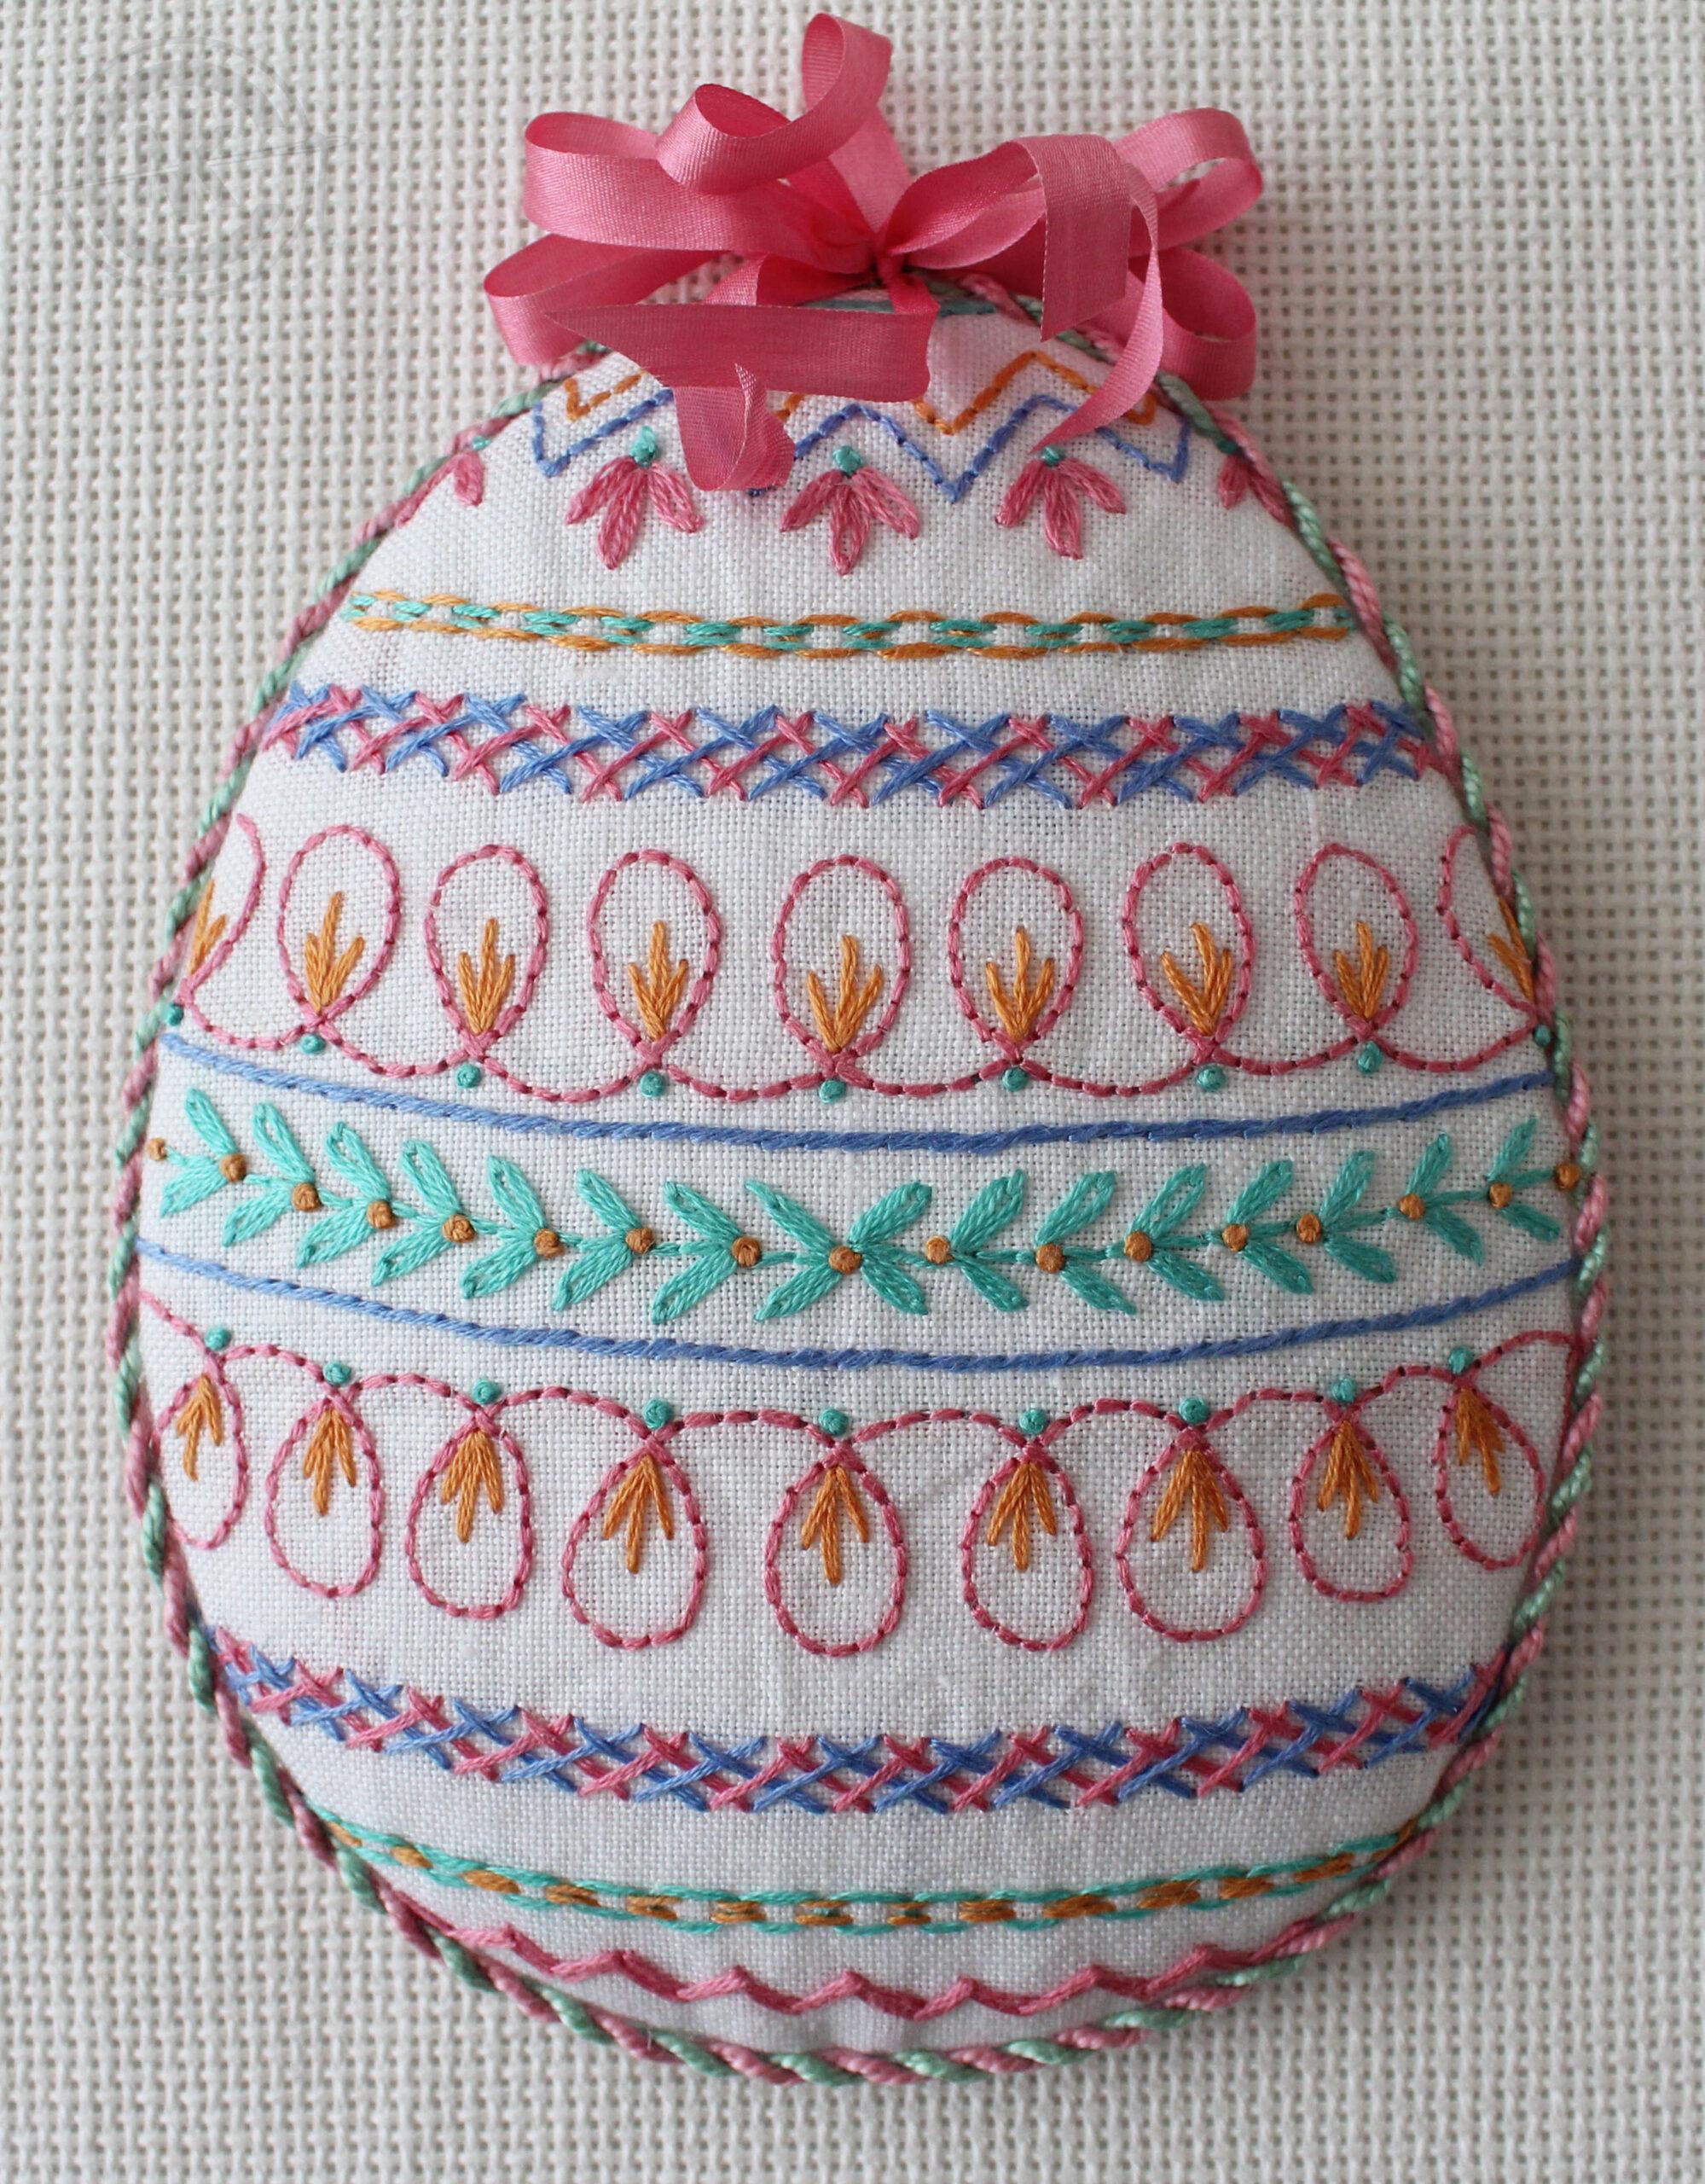 Finishing – Puffed Ornament